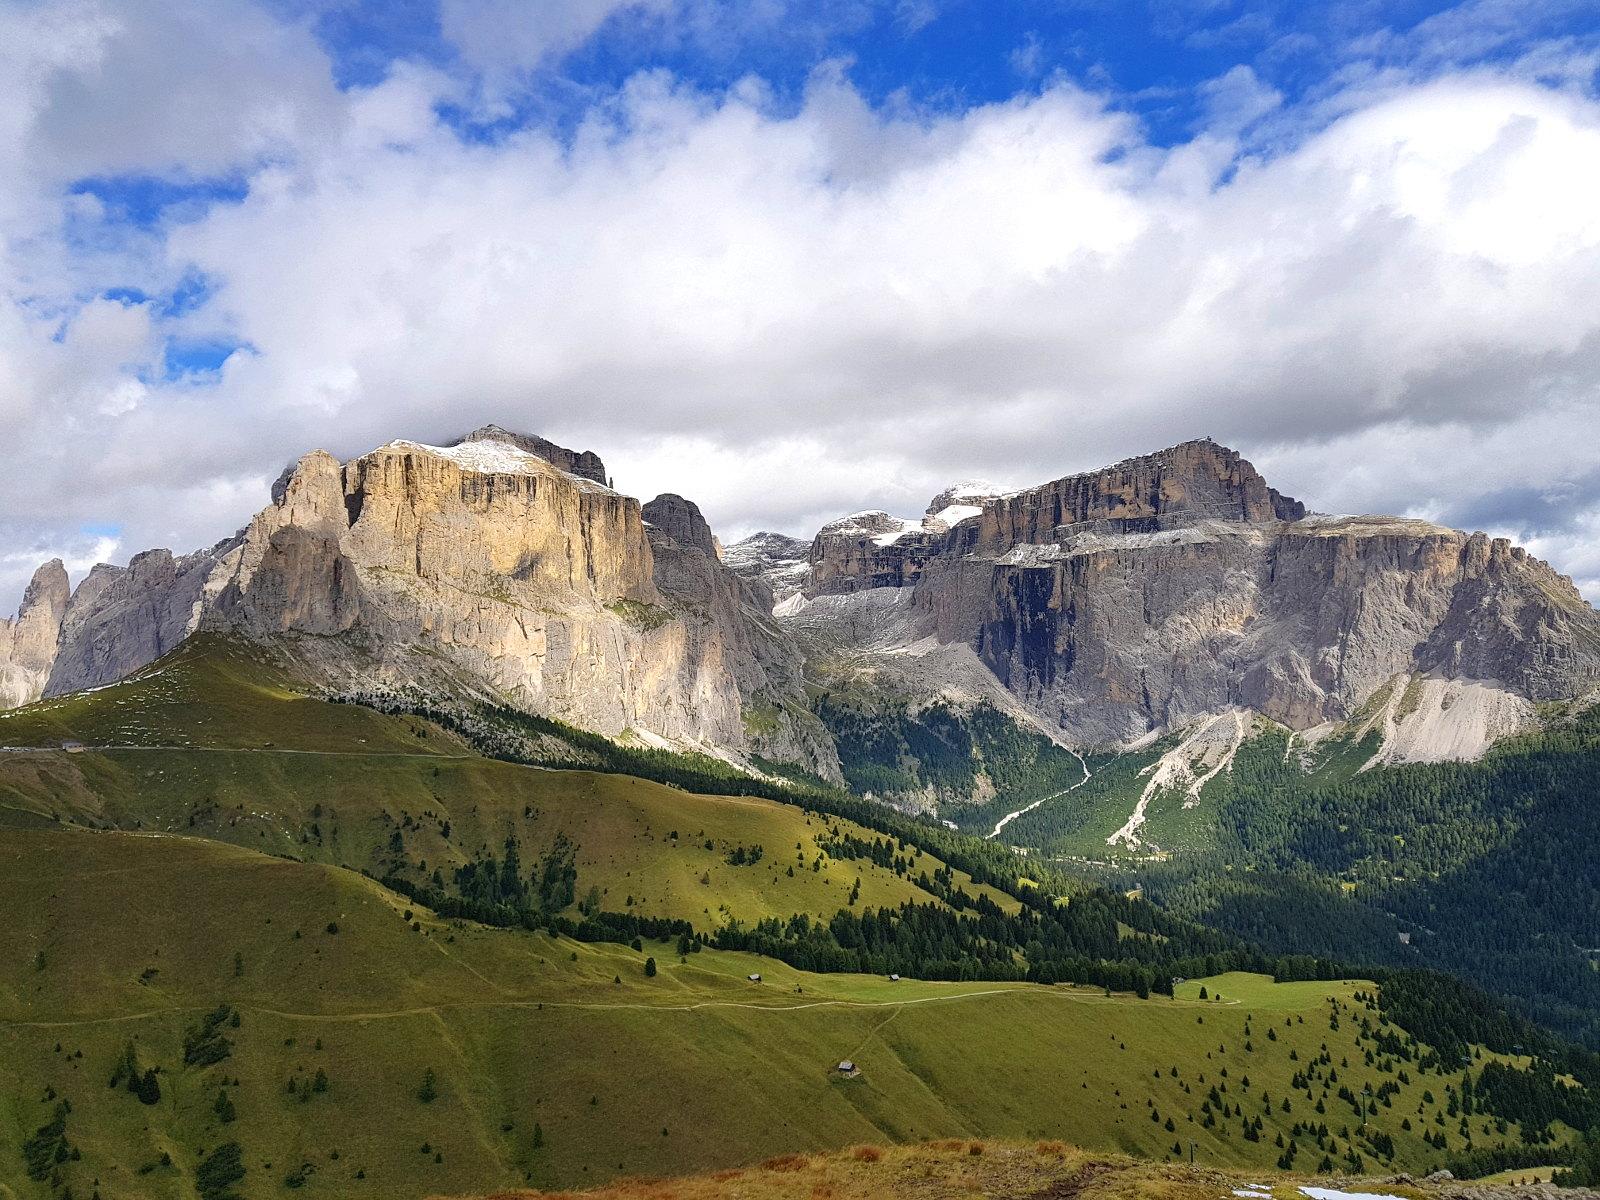 klassische Dolomiten Formationen